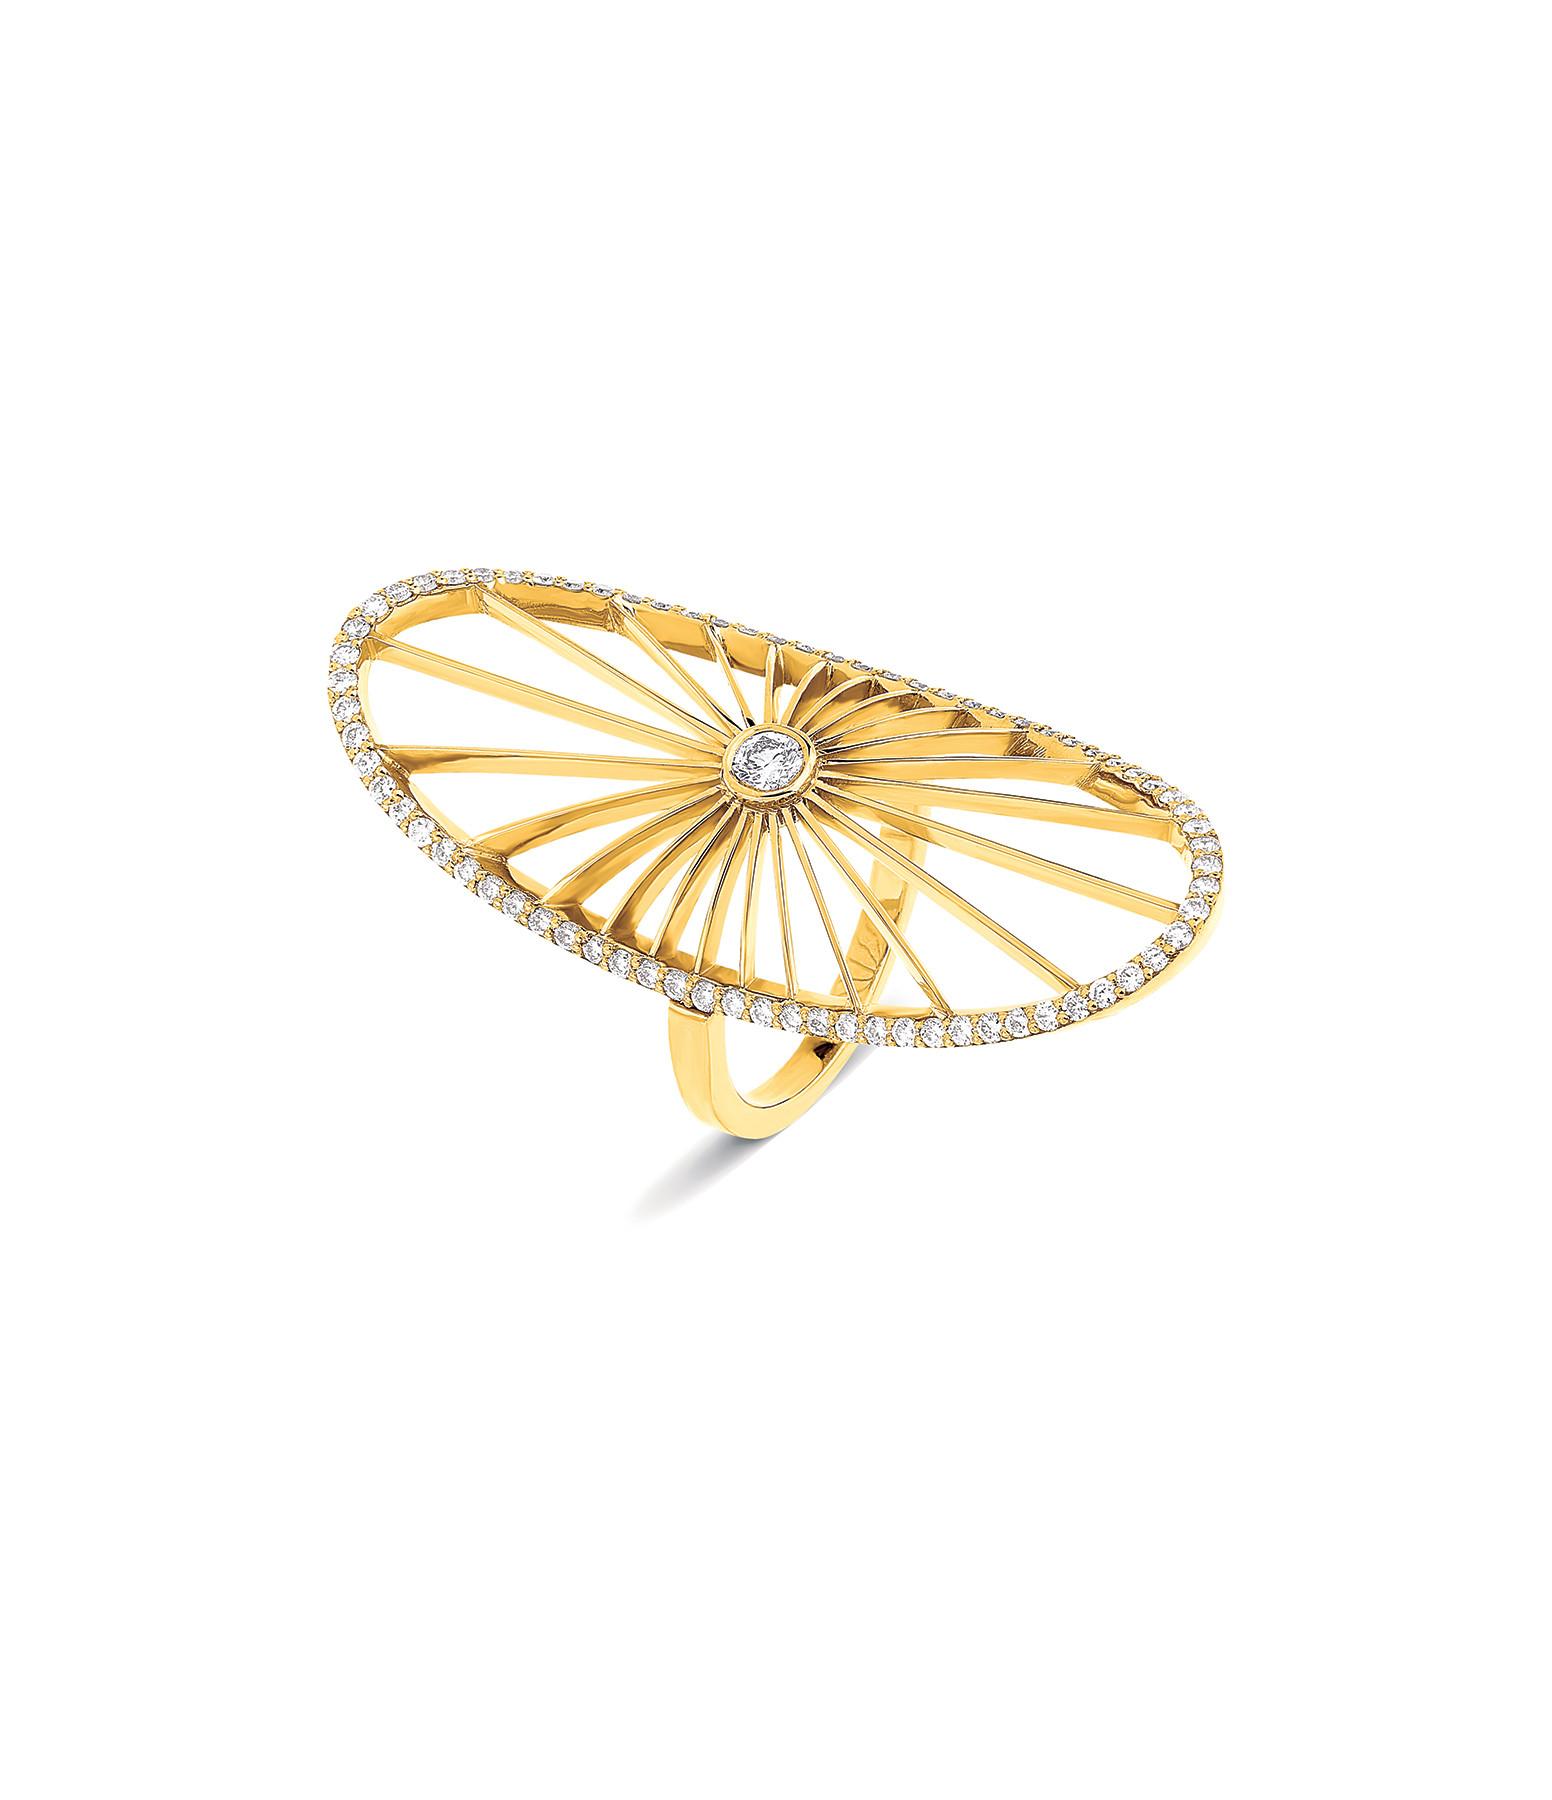 NAVA JOAILLERIE - Bague Cheyenne Ovale Diamants Or Jaune